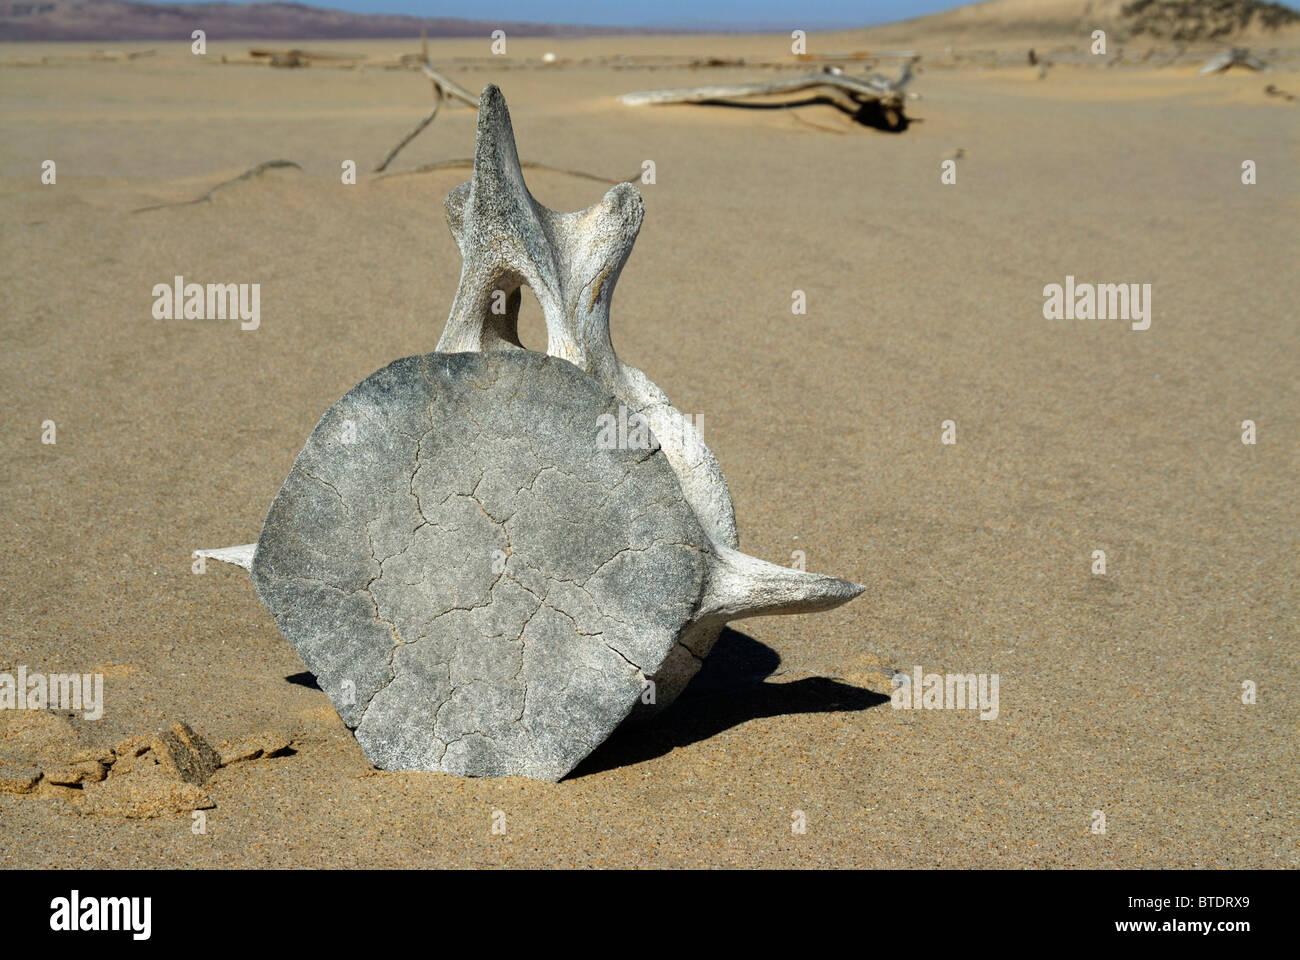 Whale vertebra on the beach - Stock Image